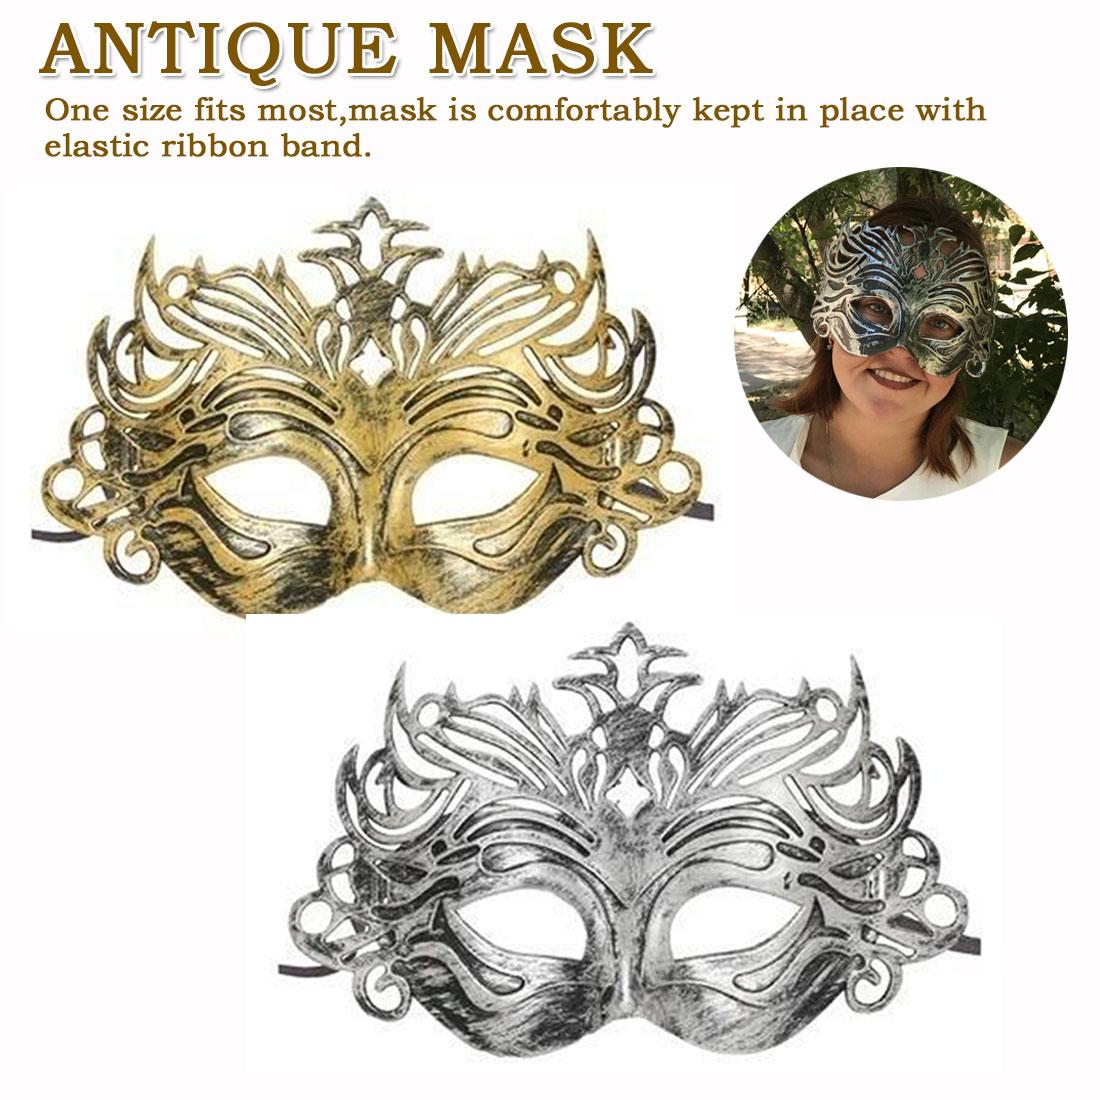 Ccufo oro masculino Griego Soldado Romano Hombres Metálico /& Máscara Mascarada Veneciana